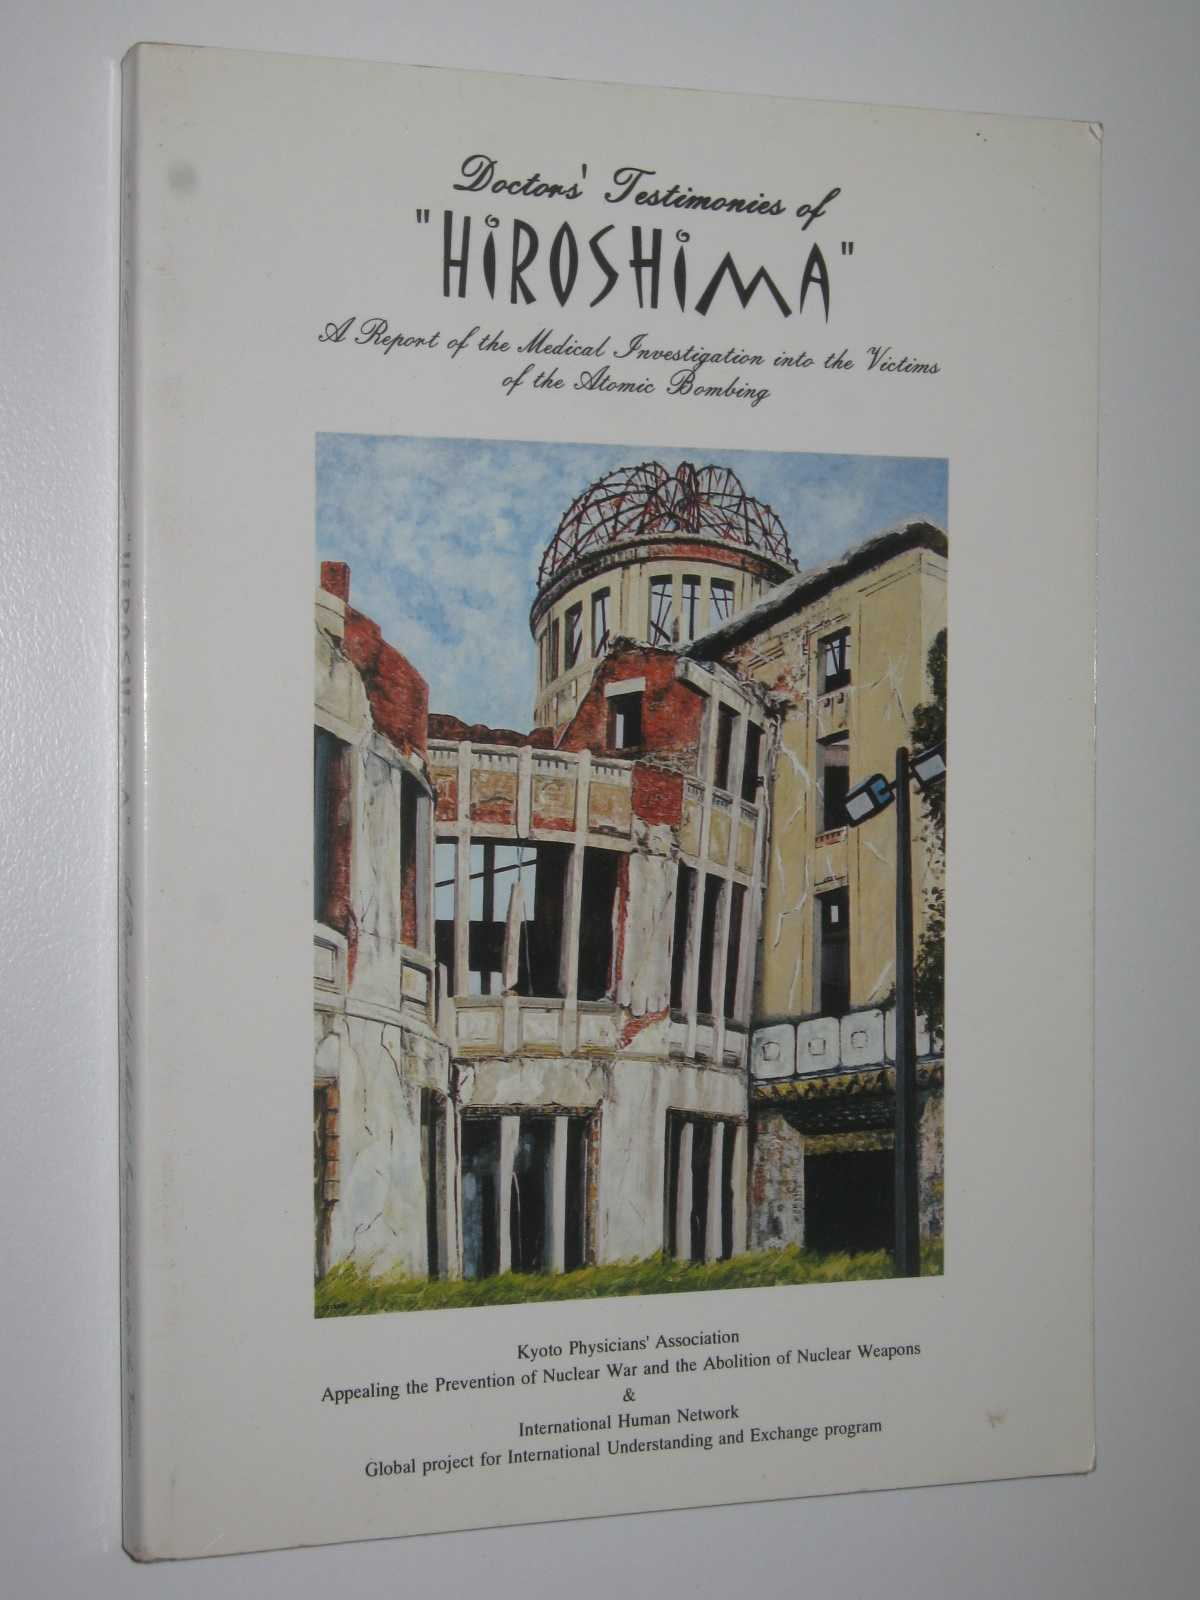 Doctors' Testimonies of Hiroshima, Kyoto Physicians' Association